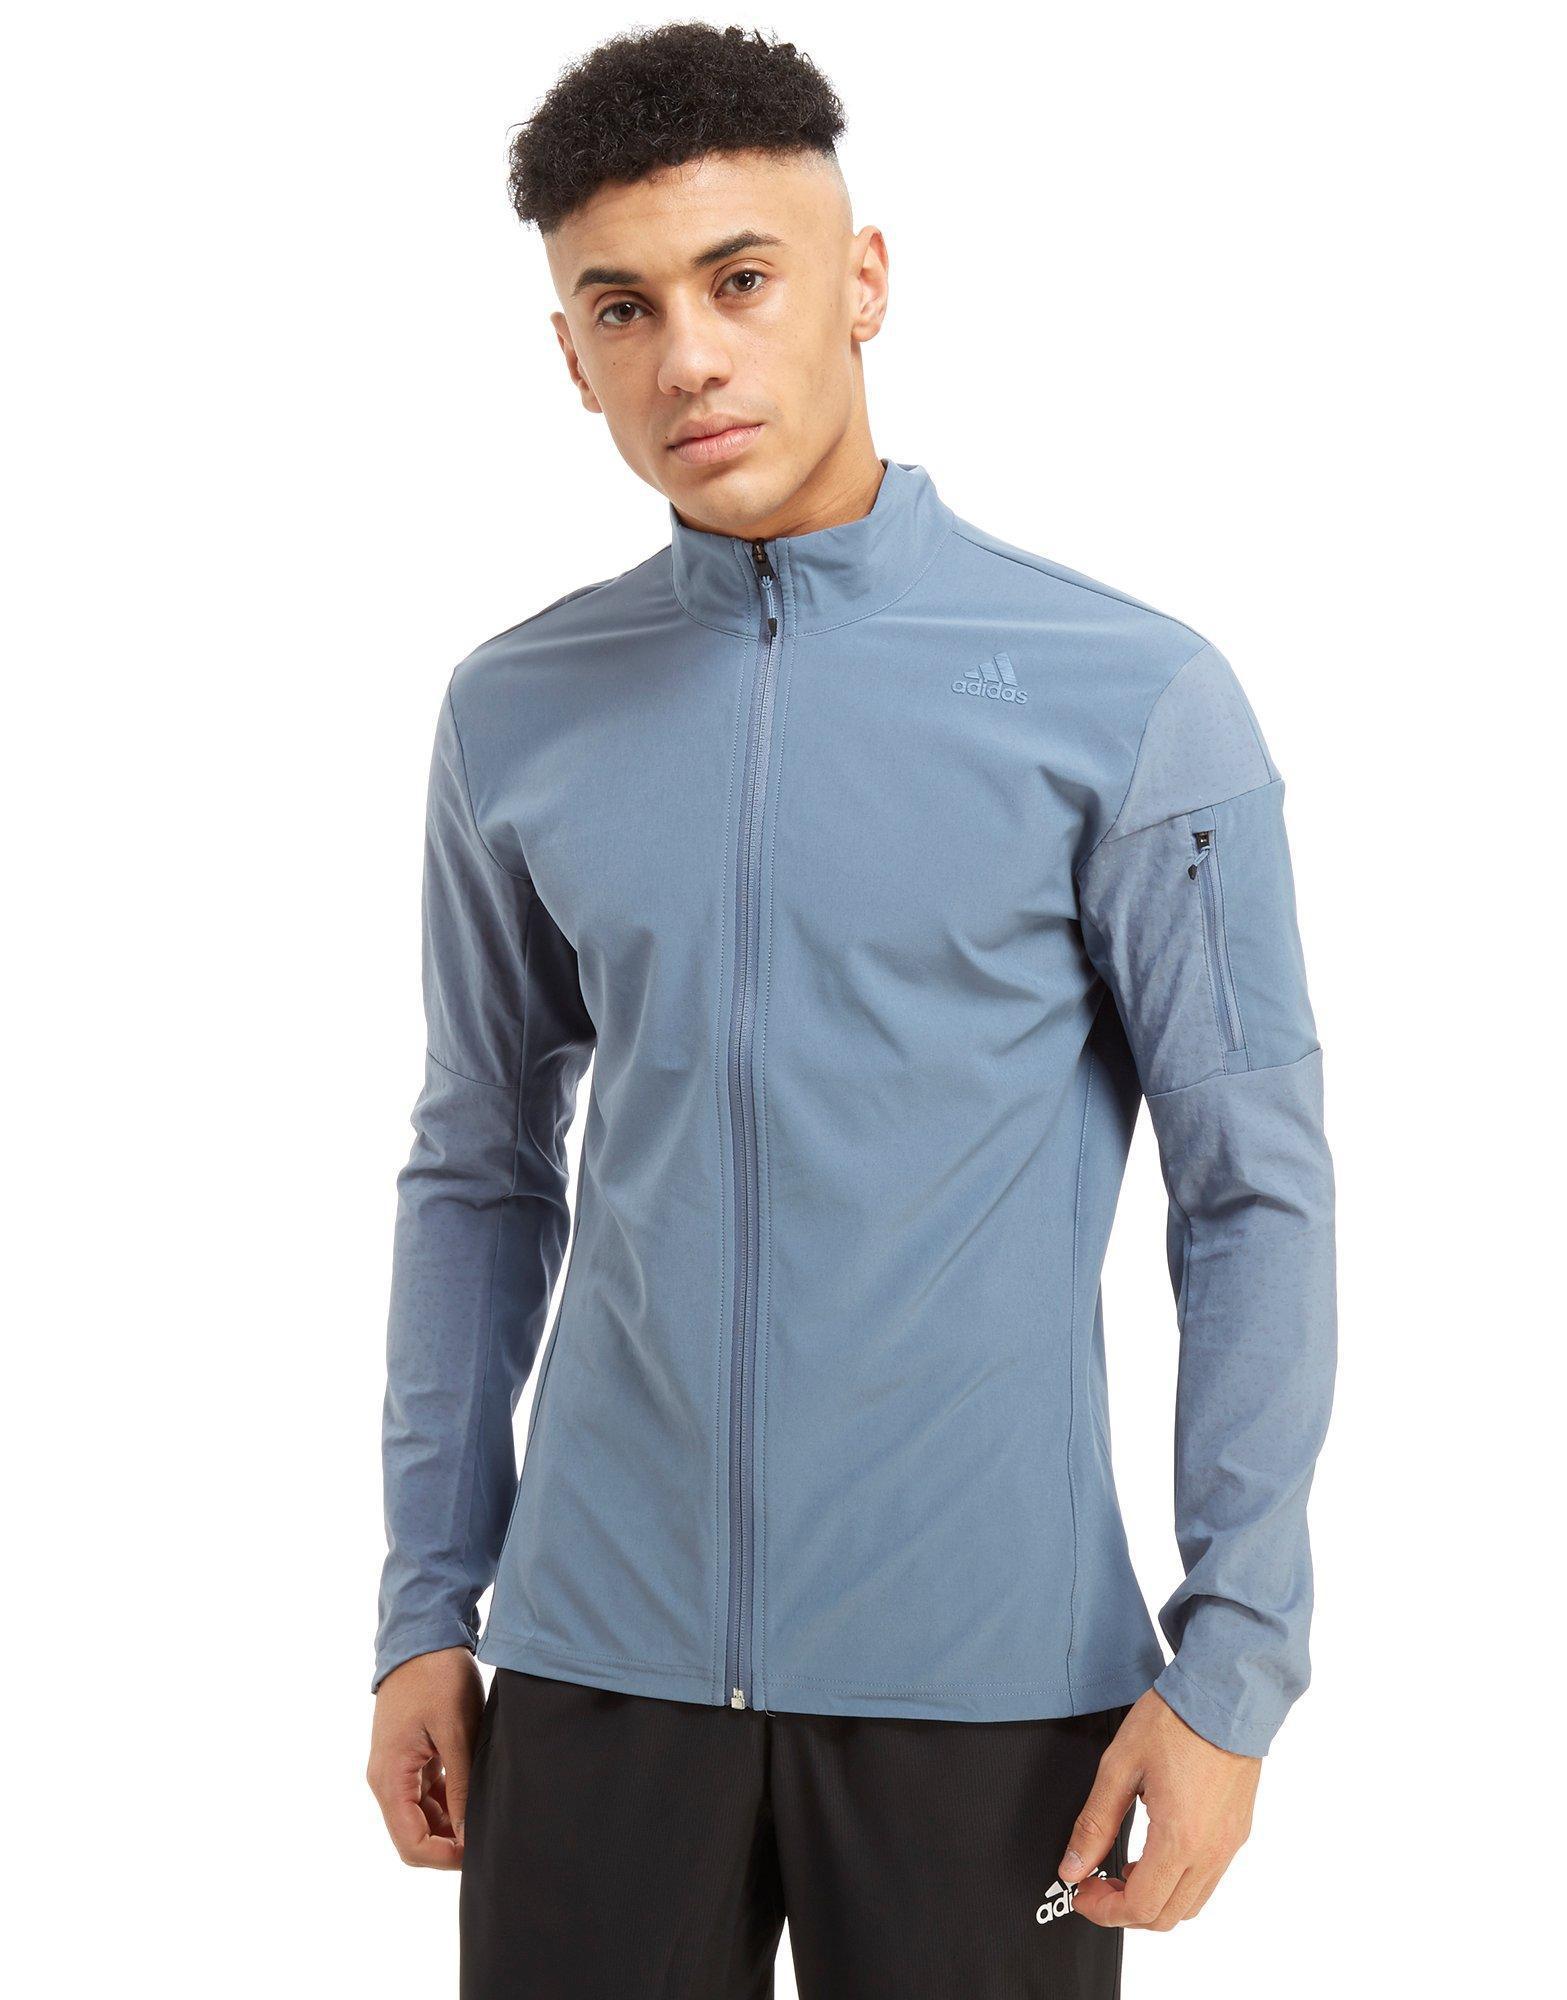 adidas Supernova Storm Jacket in Blue for Men Lyst